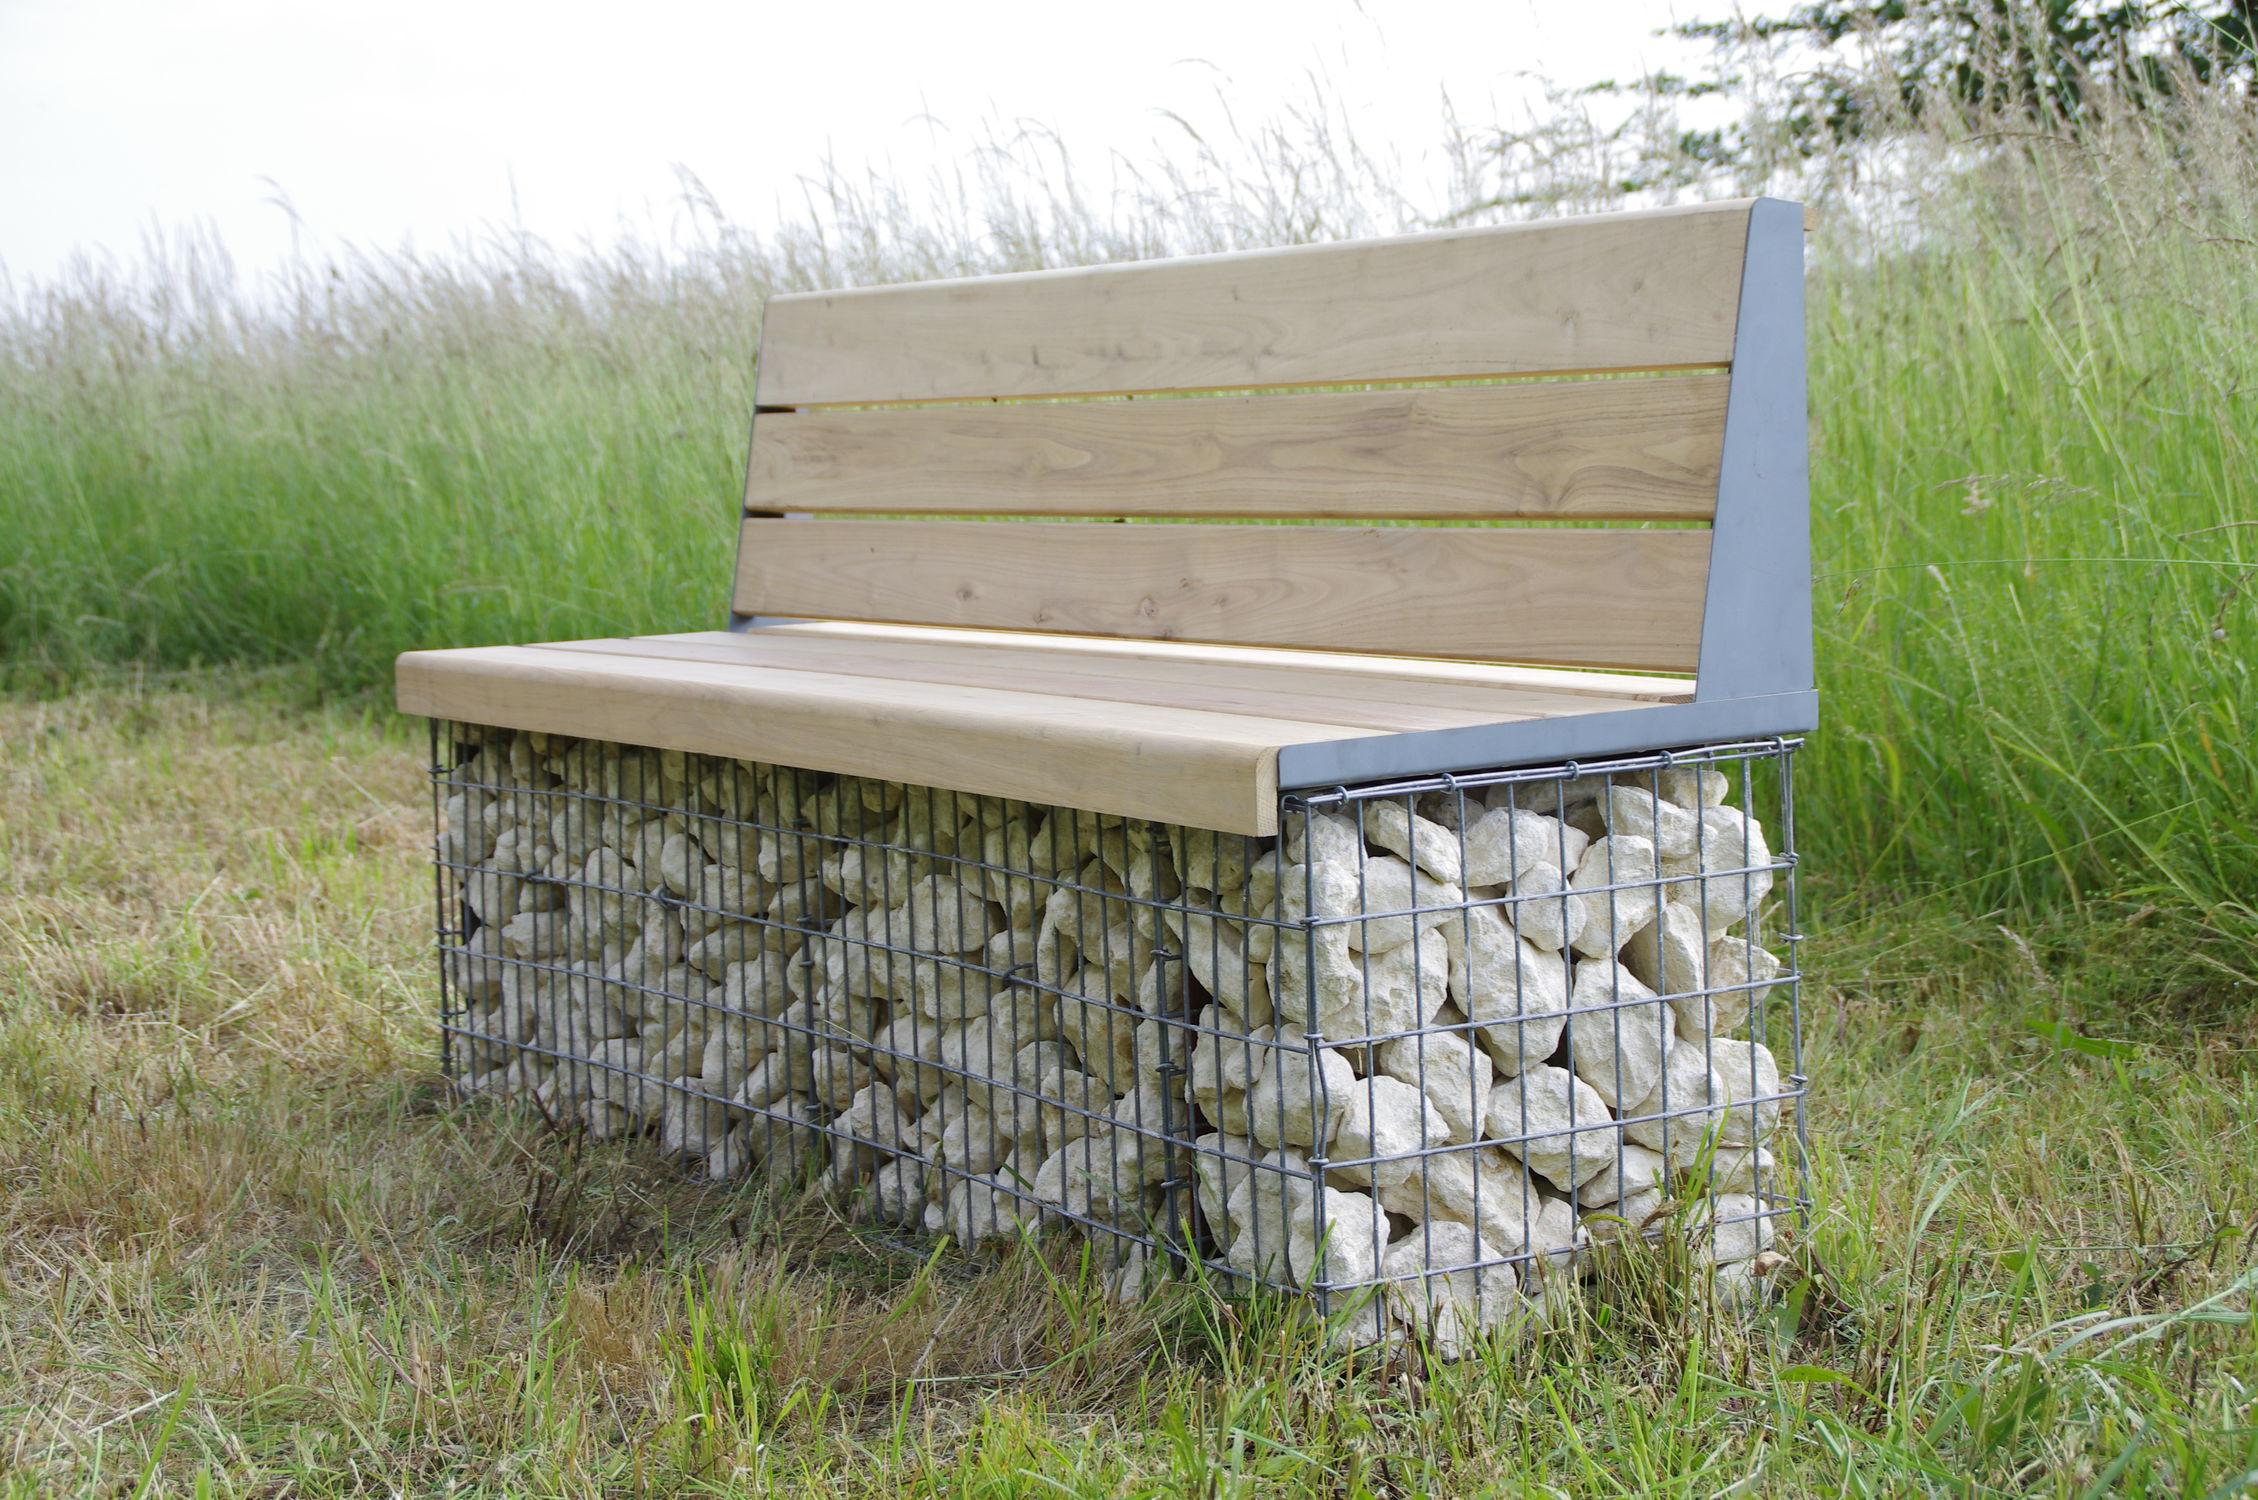 Banc public / de jardin / contemporain / en acier galvanisé ...